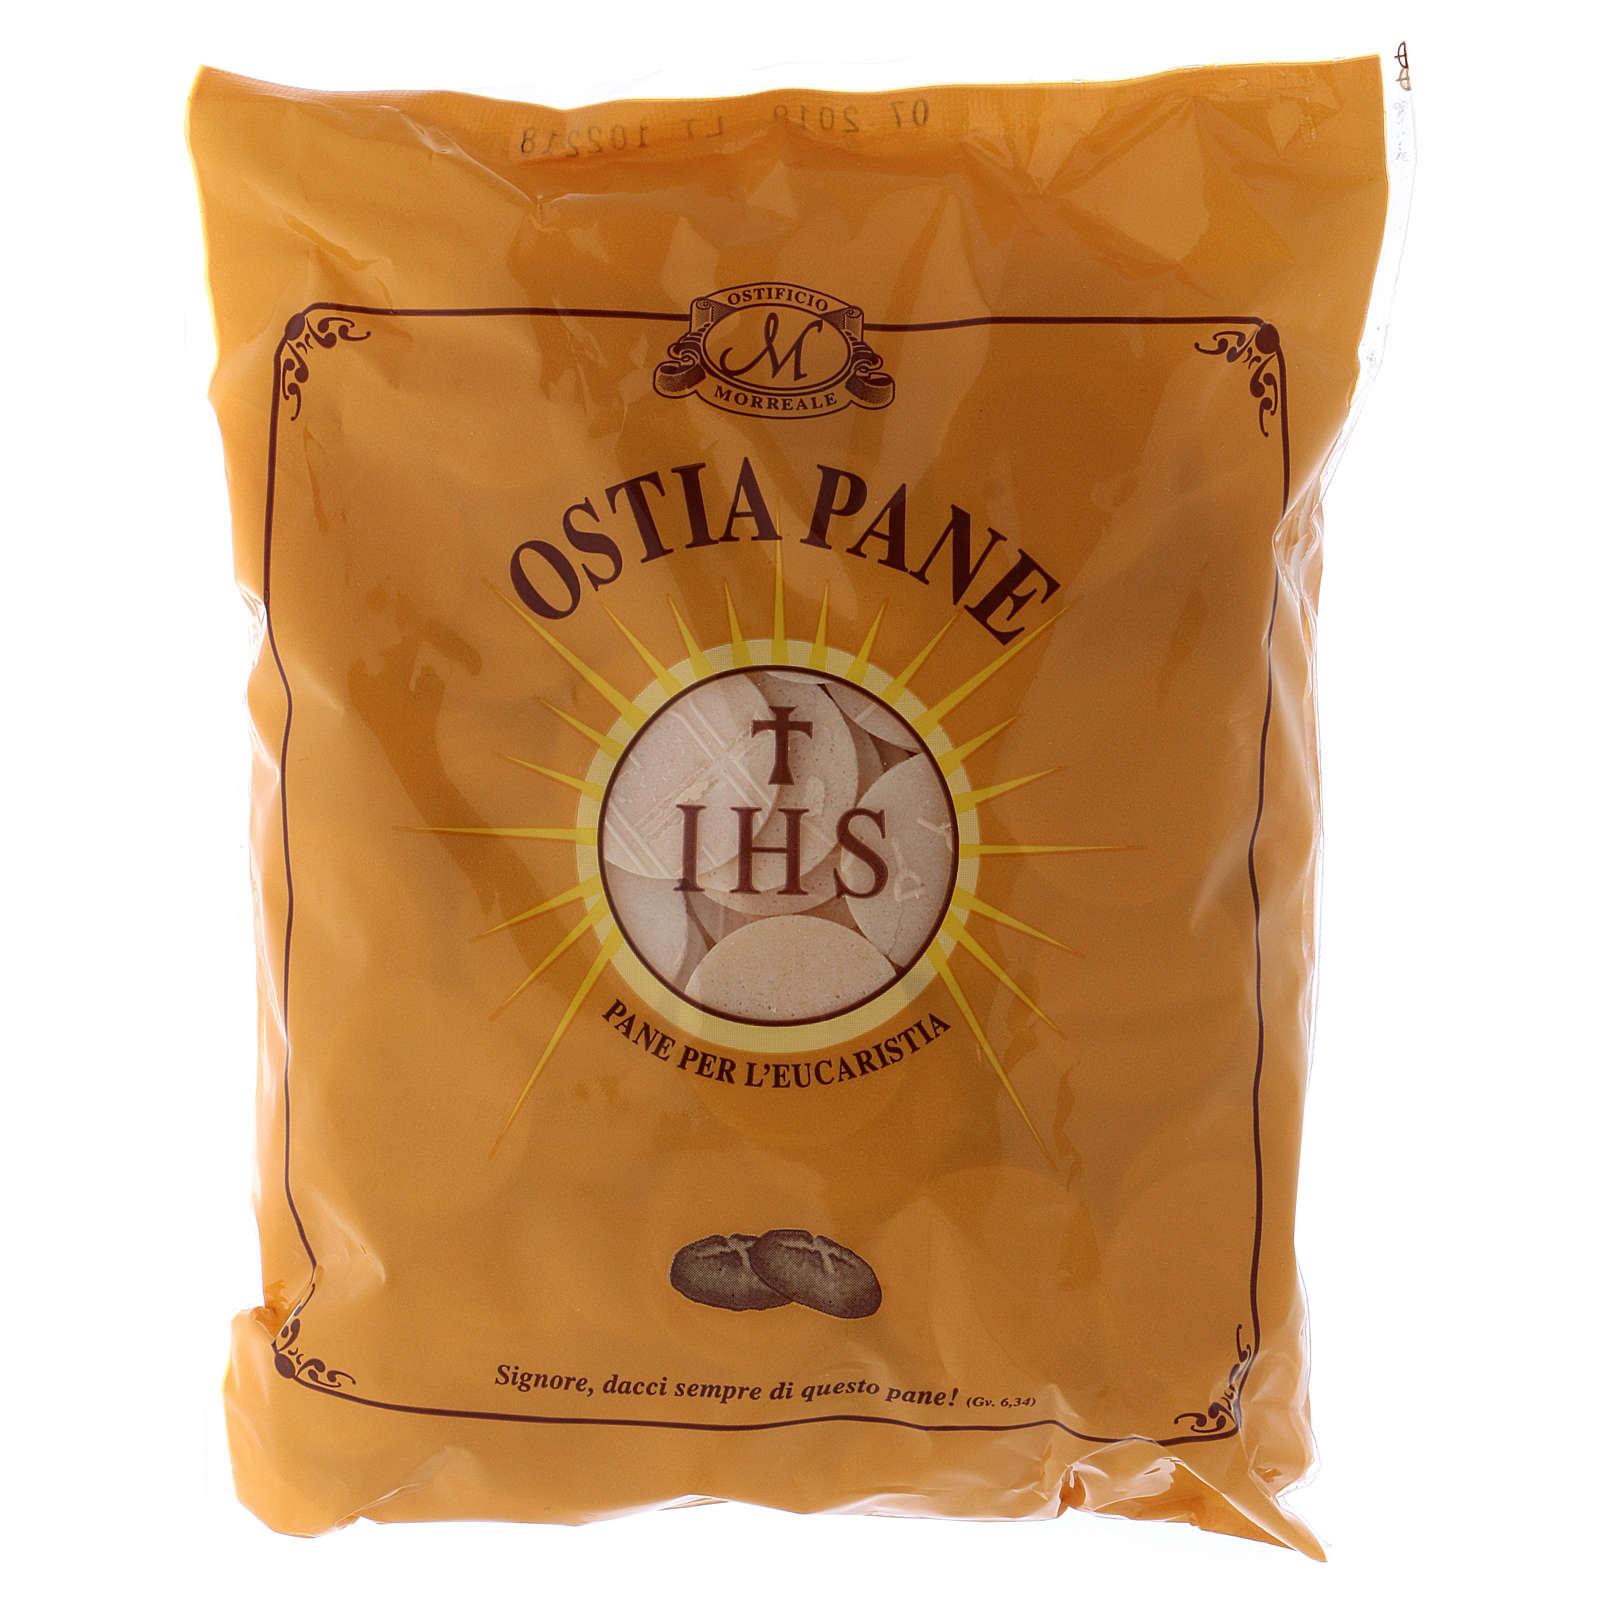 Thick altar bread 3.5 cm diameter 500 pcs bag 3